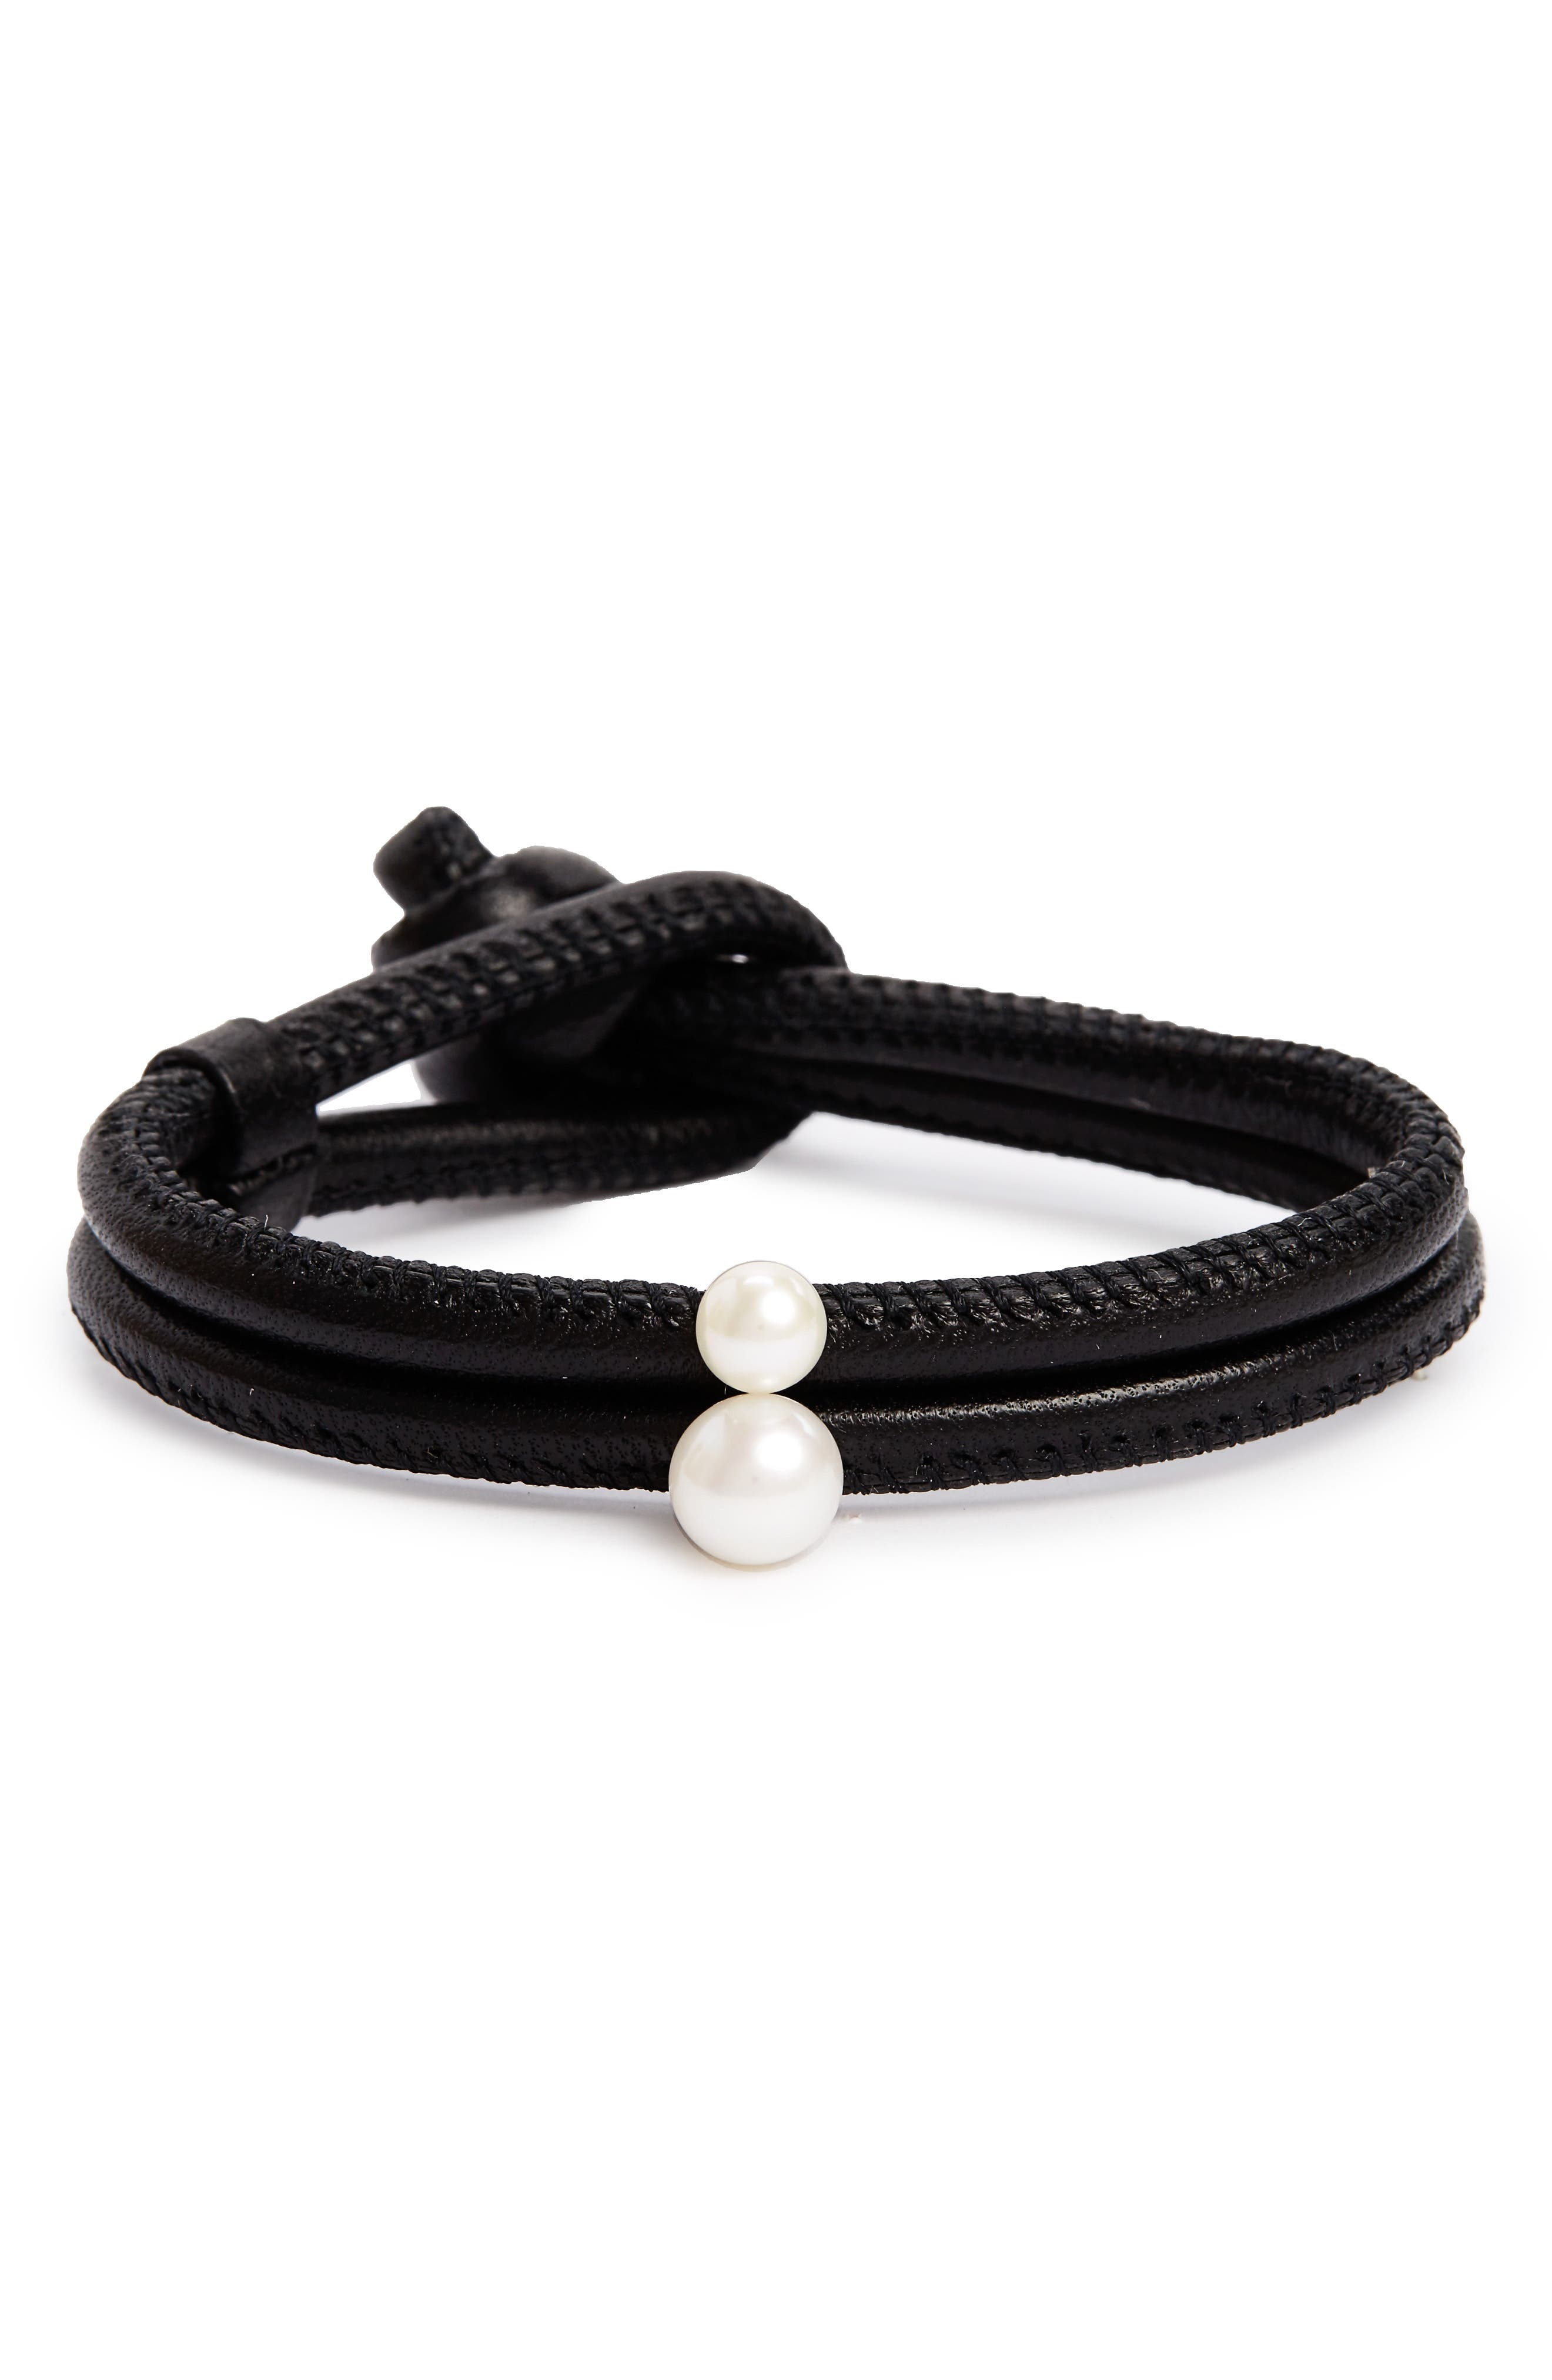 Mizuki Sea of Beauty Black Leather Wrap Bracelet with Pearls rEwnE